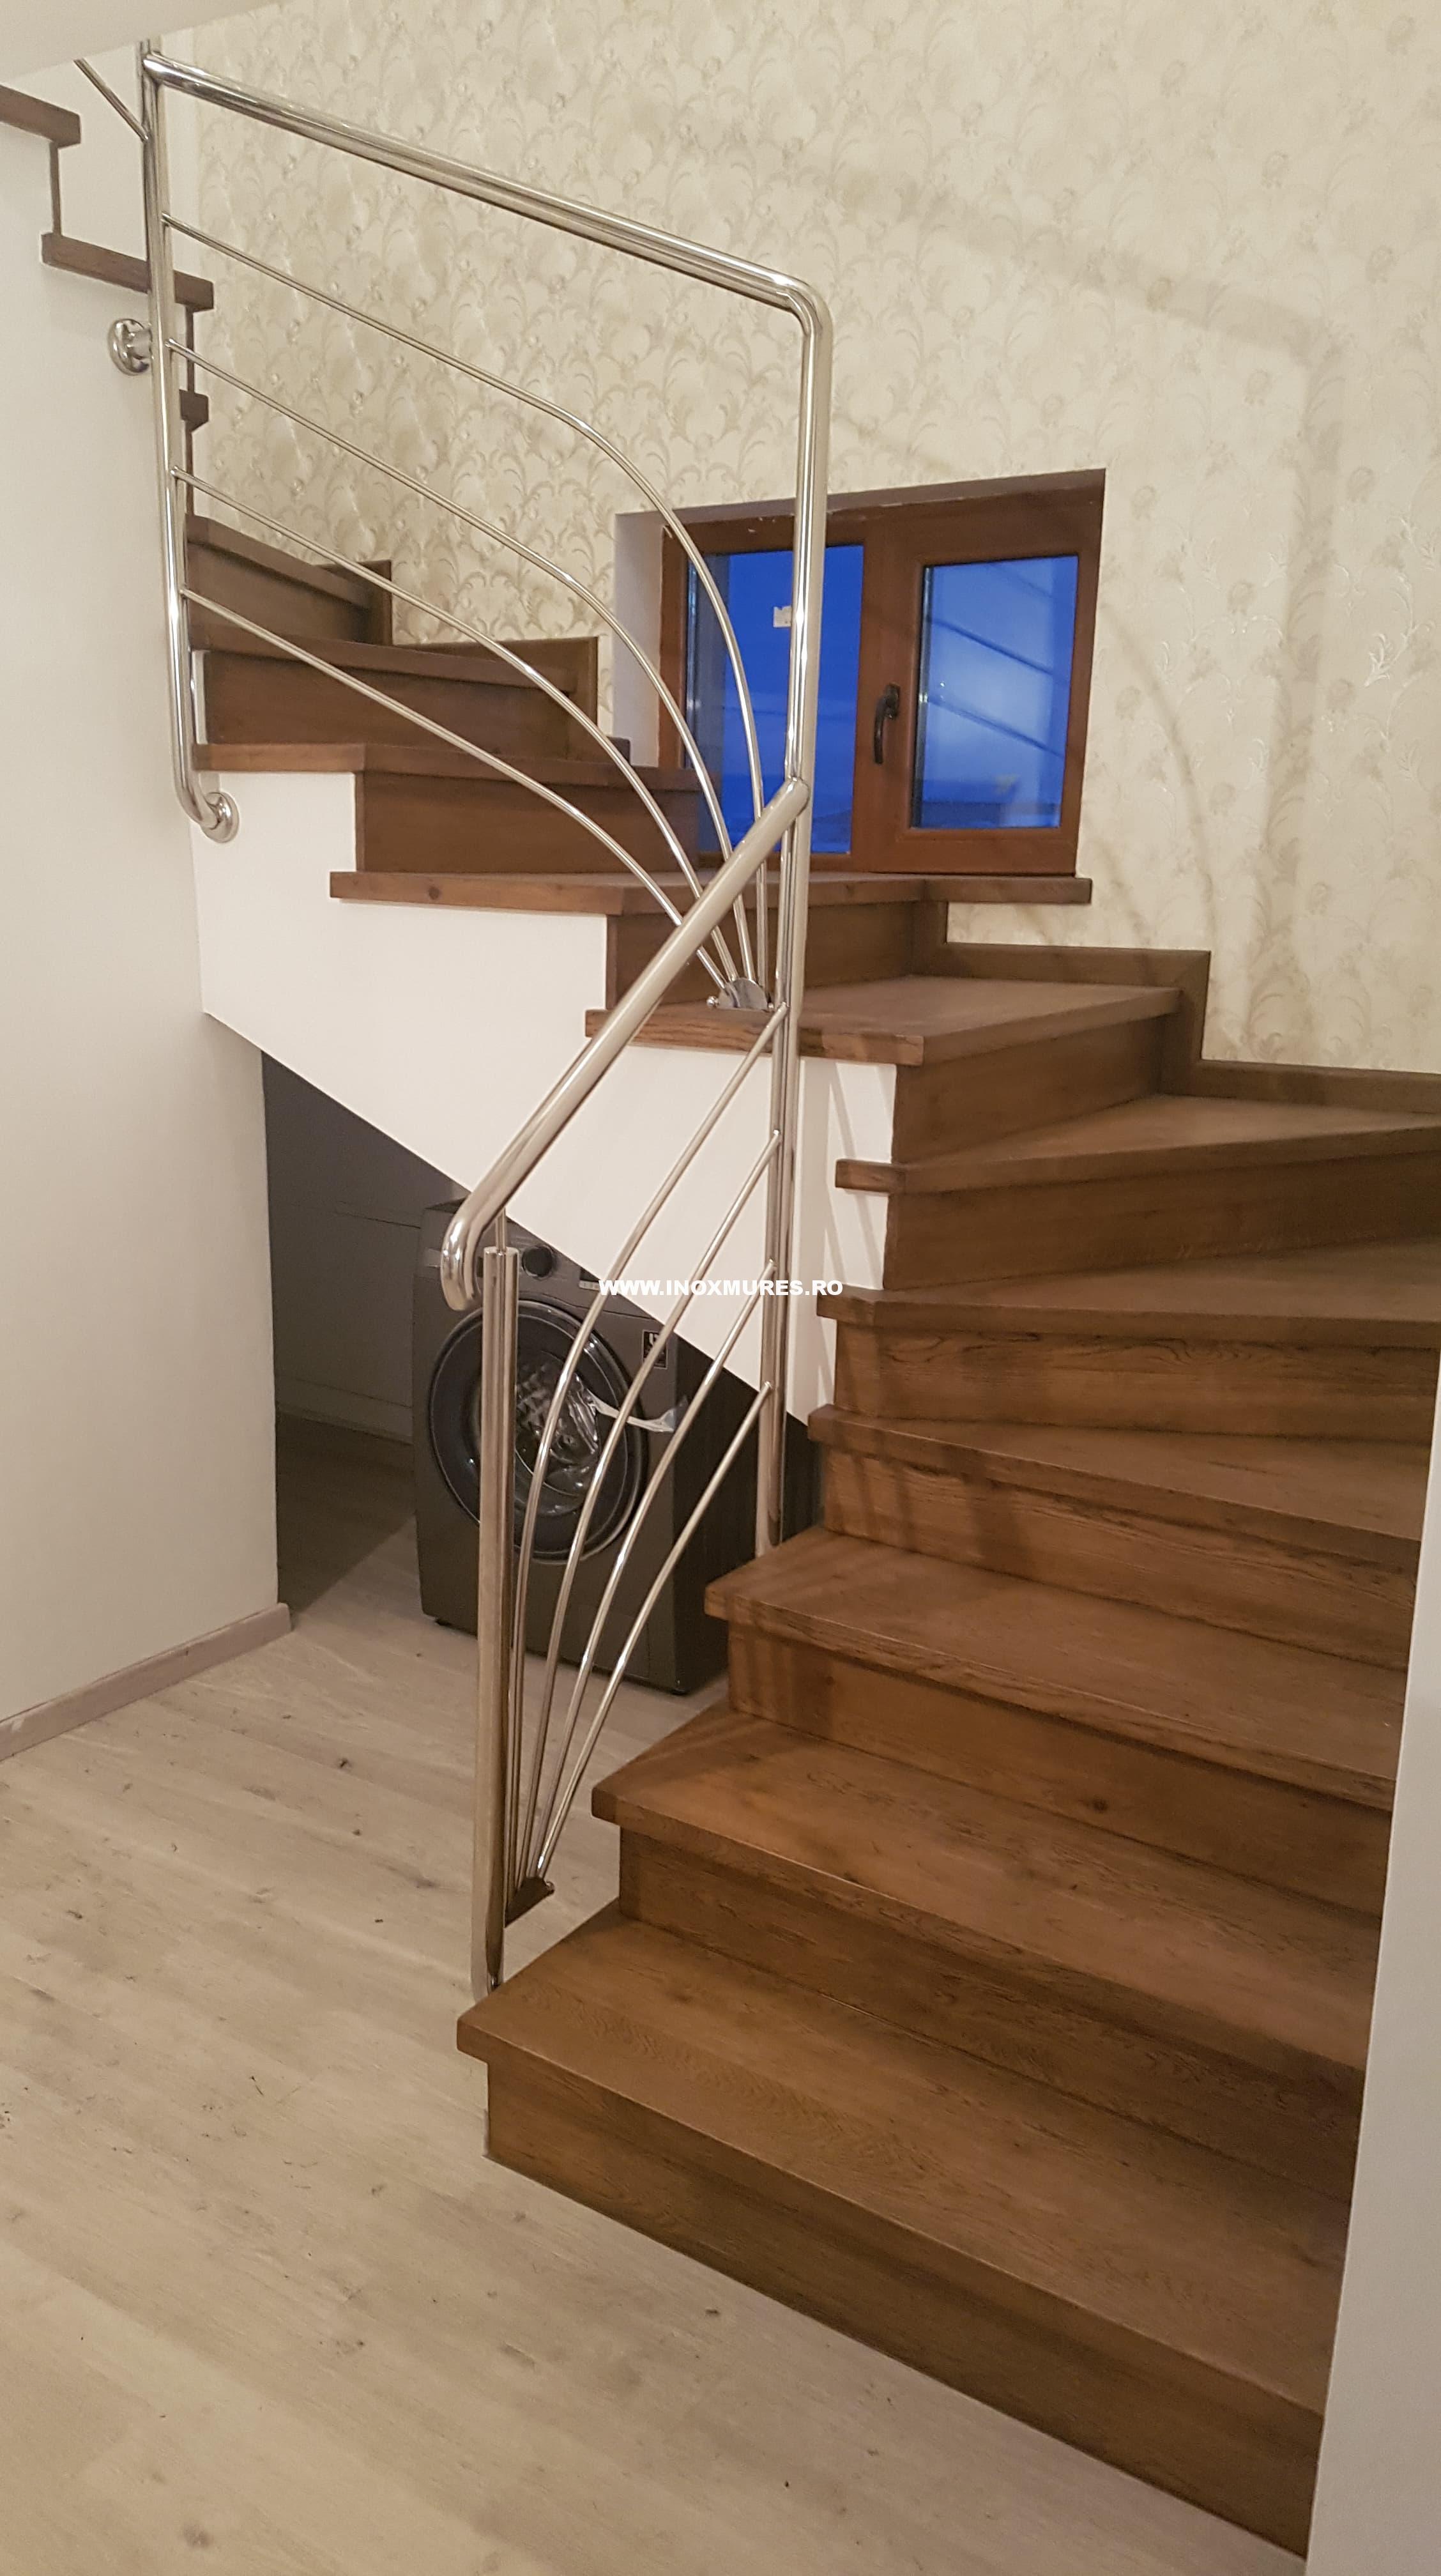 Balustrada inox Viisoara, Campia Turzii 17.12.2018